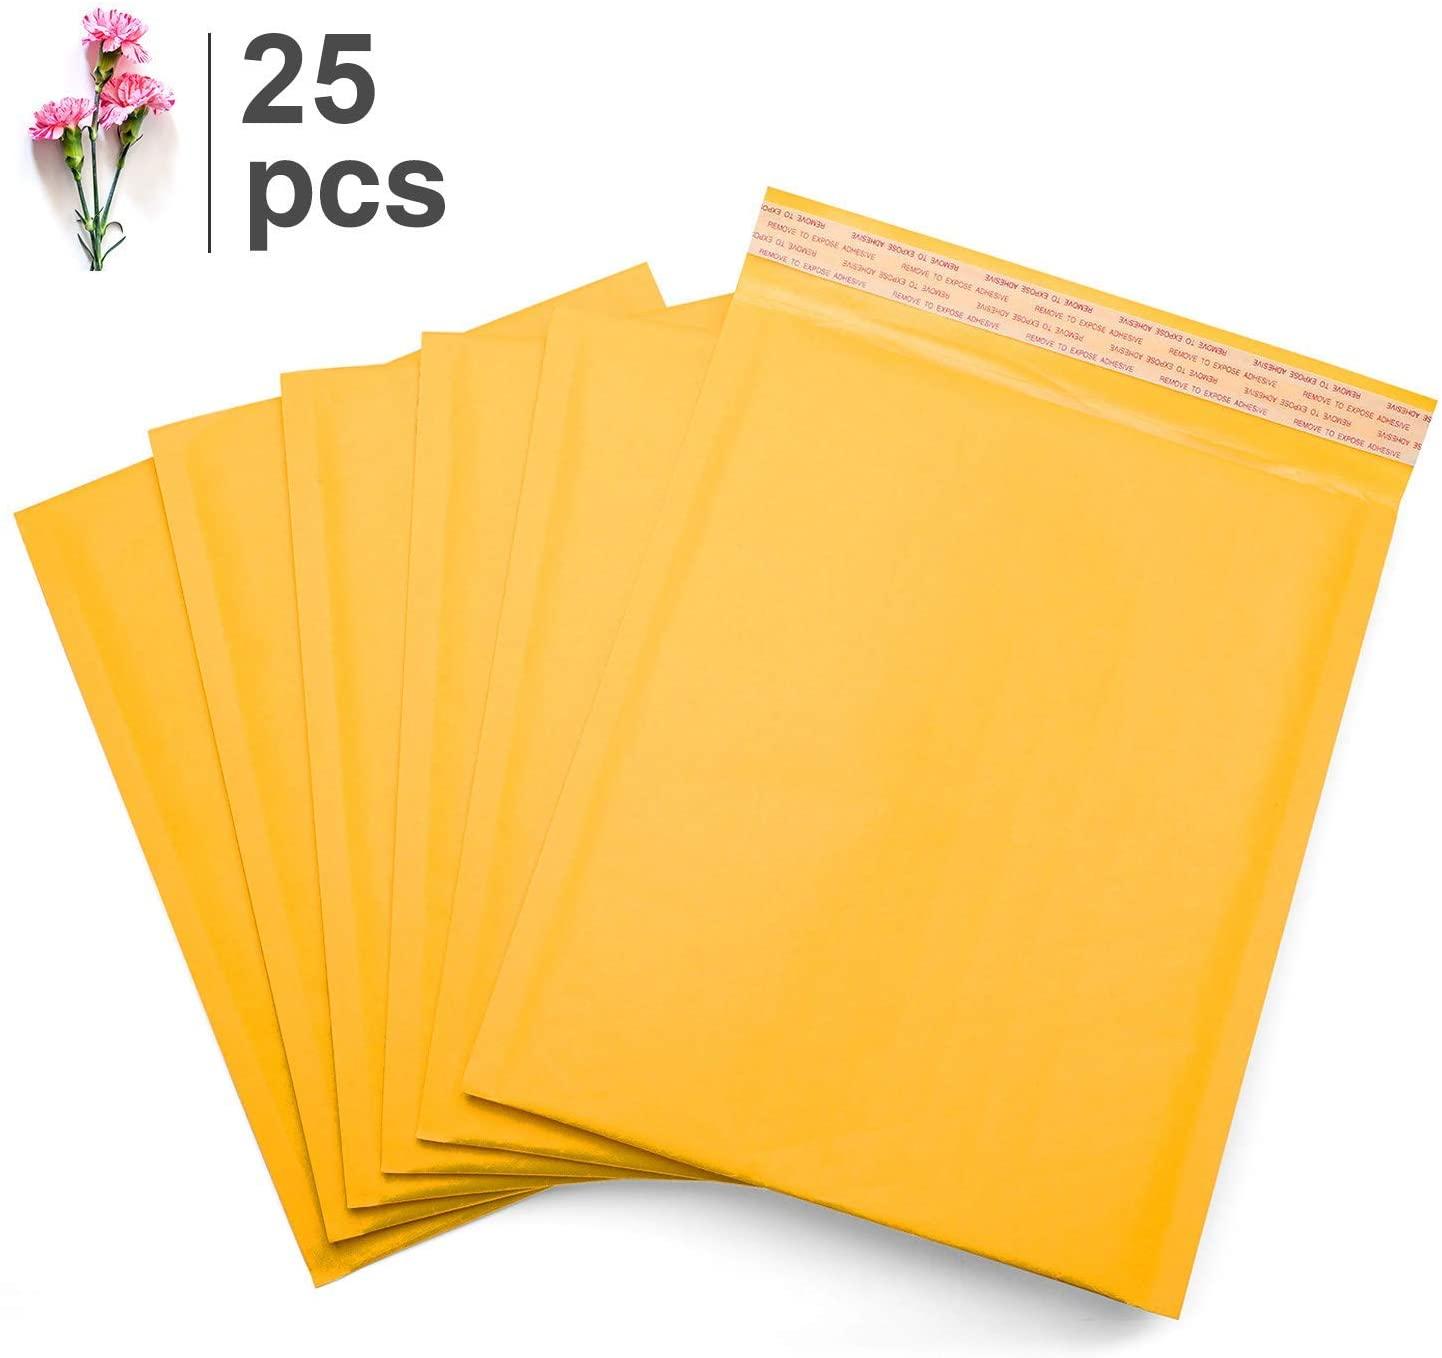 Kraft Bubble Mailers #7 Padded Envelopes Shipping Bags Self Sealing 14.5